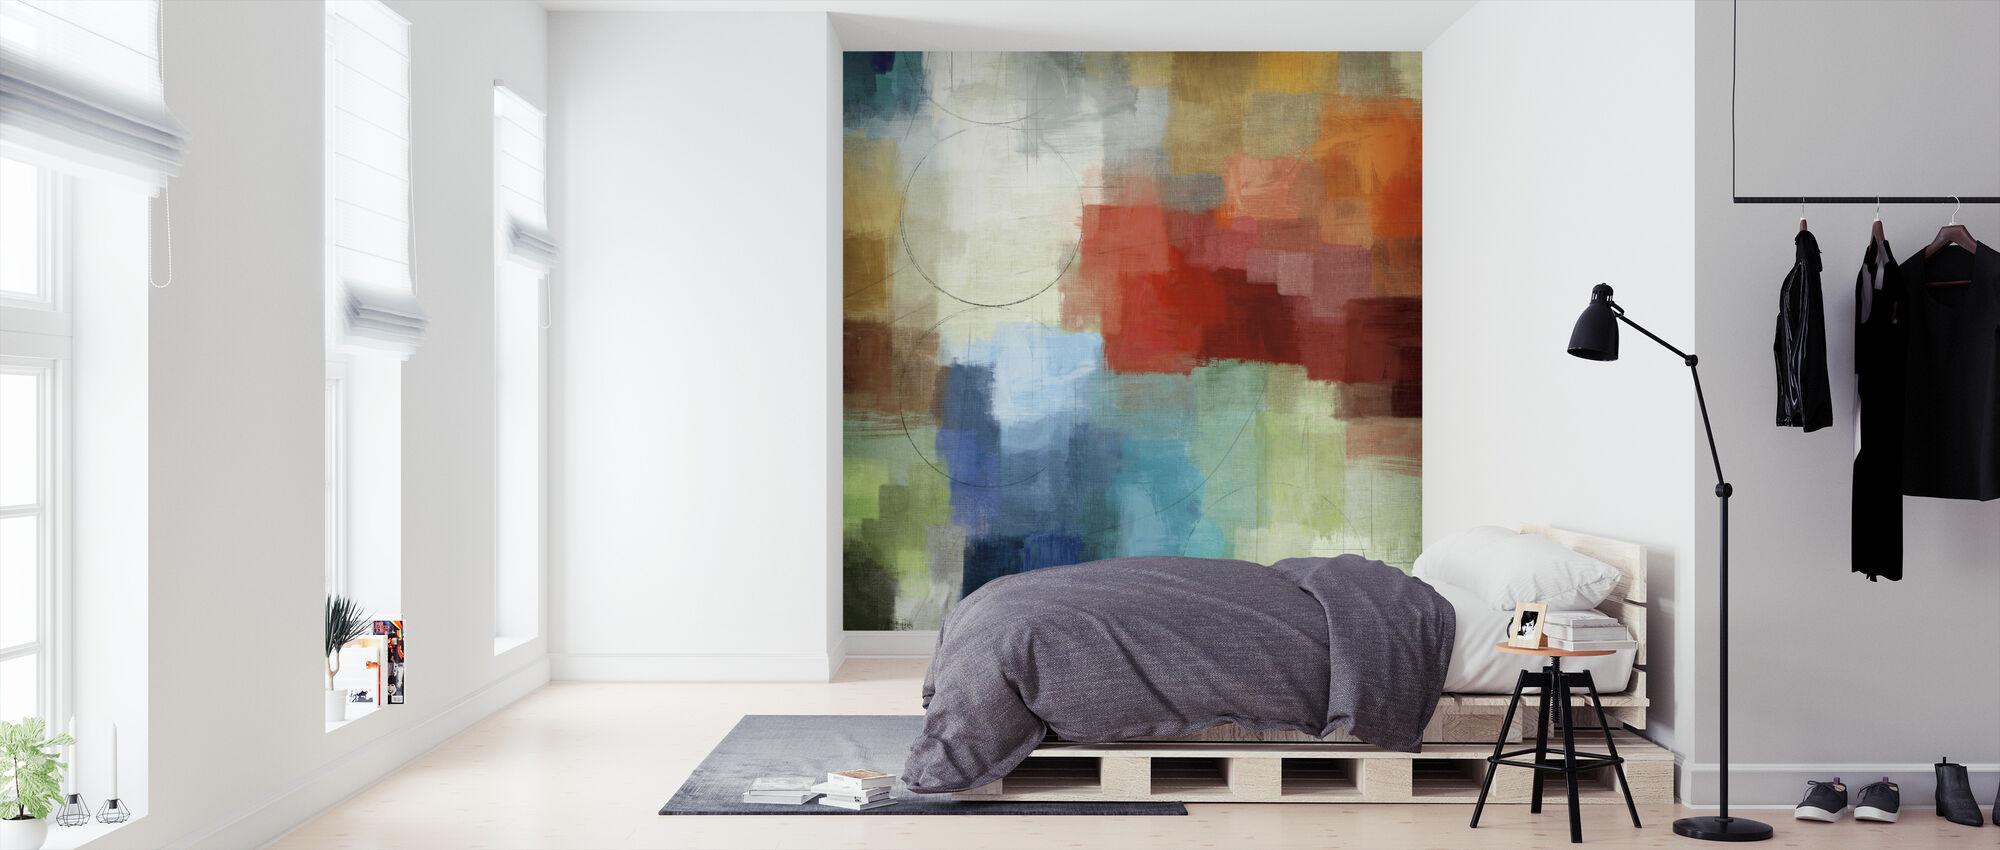 Seasons - Wallpaper - Bedroom